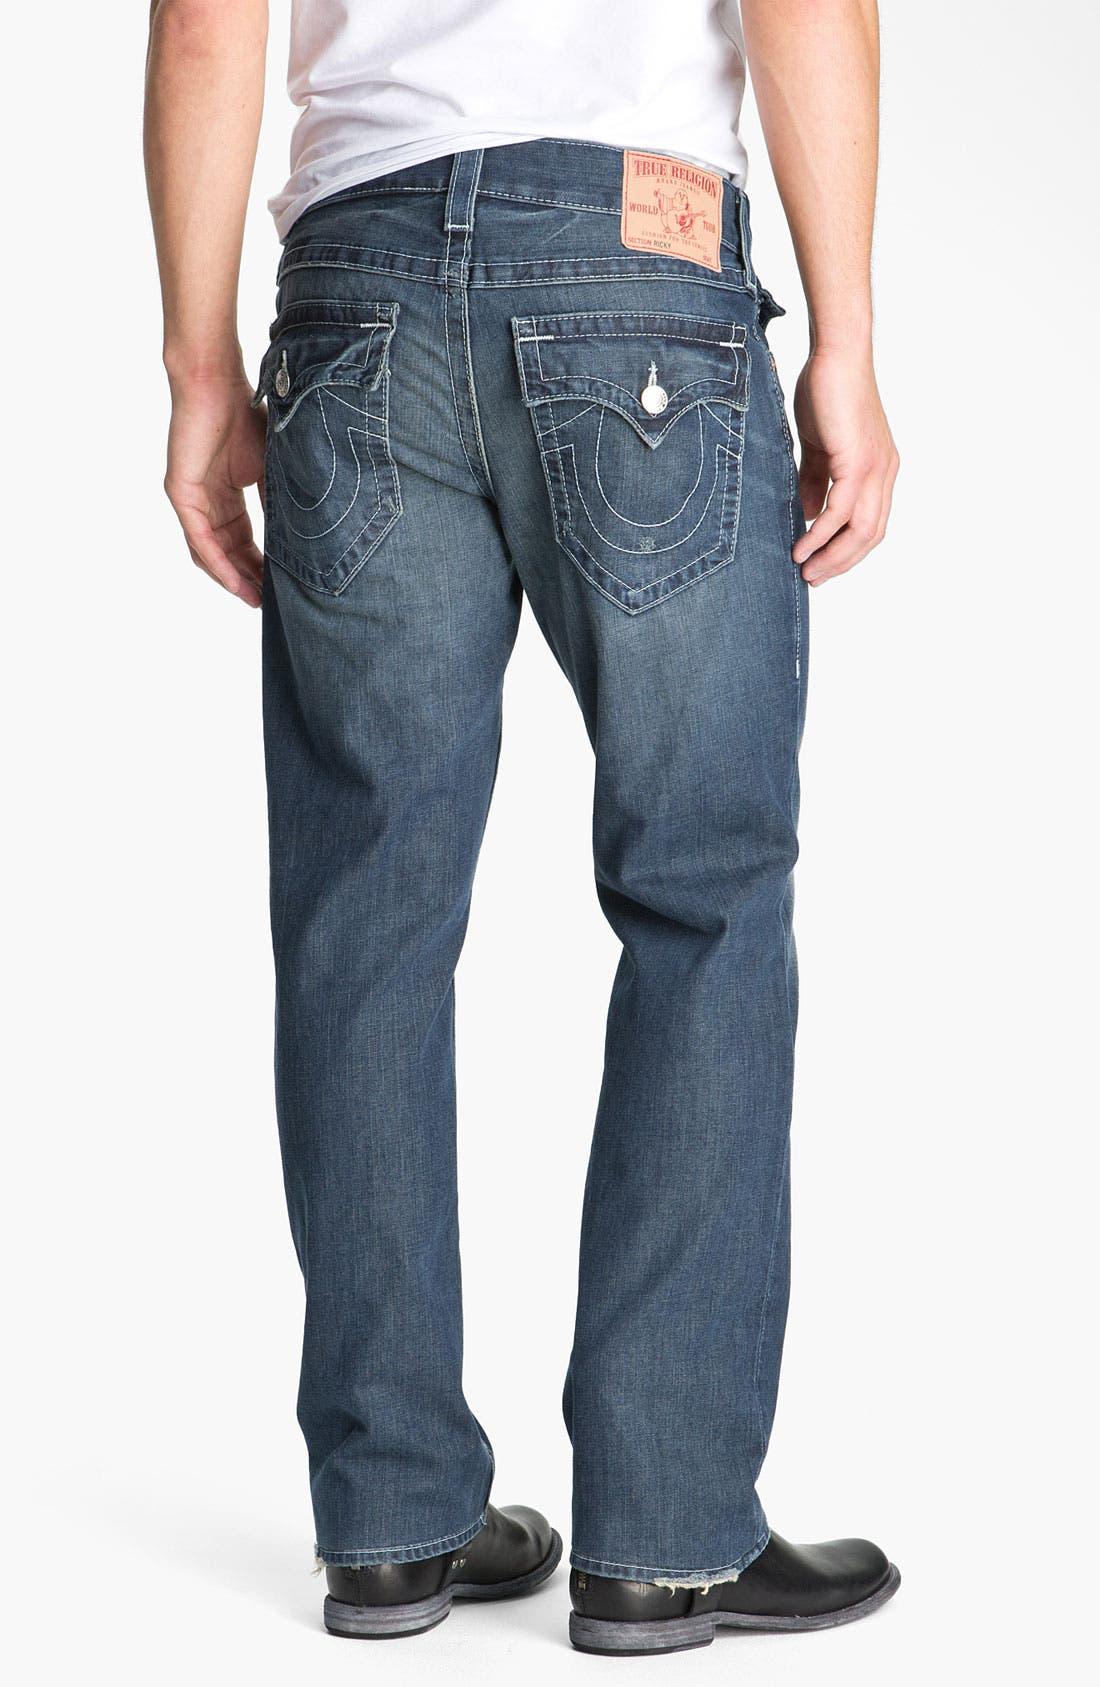 Main Image - True Religion Brand Jeans 'Ricky - Natural' Straight Leg Jeans (Surfer Dark)